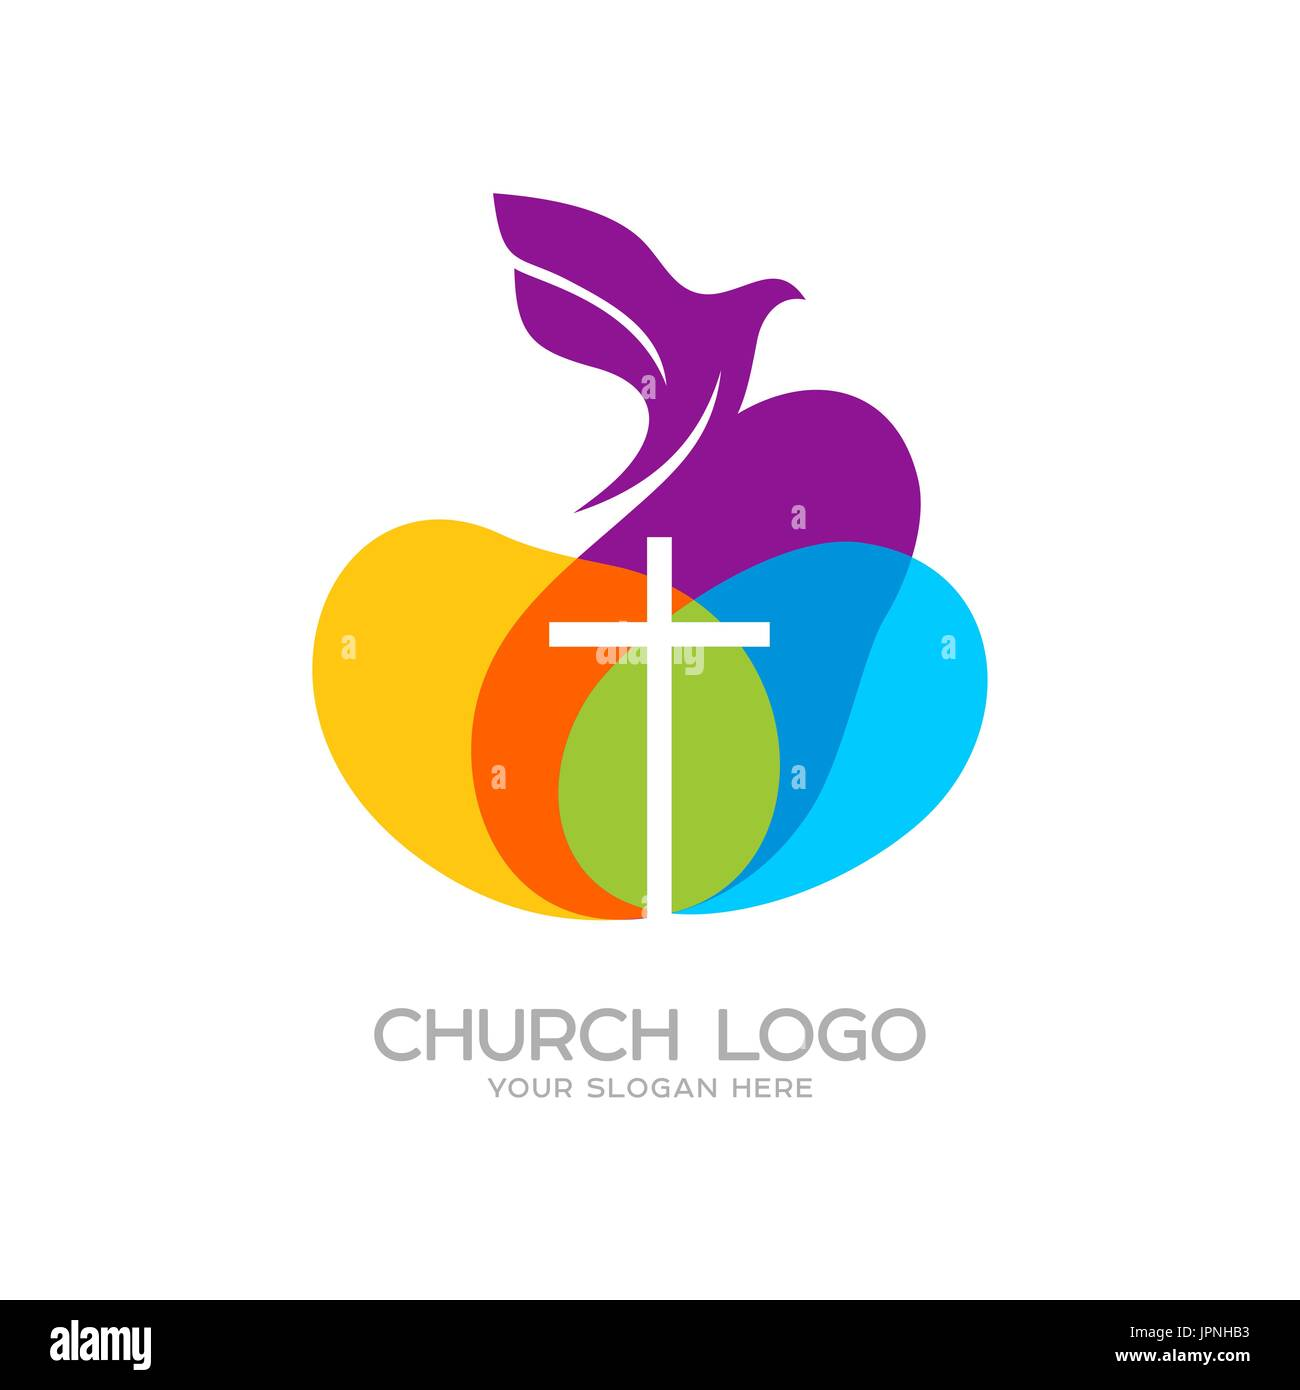 Church logo christian symbols the dove and the cross of jesus church logo christian symbols the dove and the cross of jesus thecheapjerseys Gallery